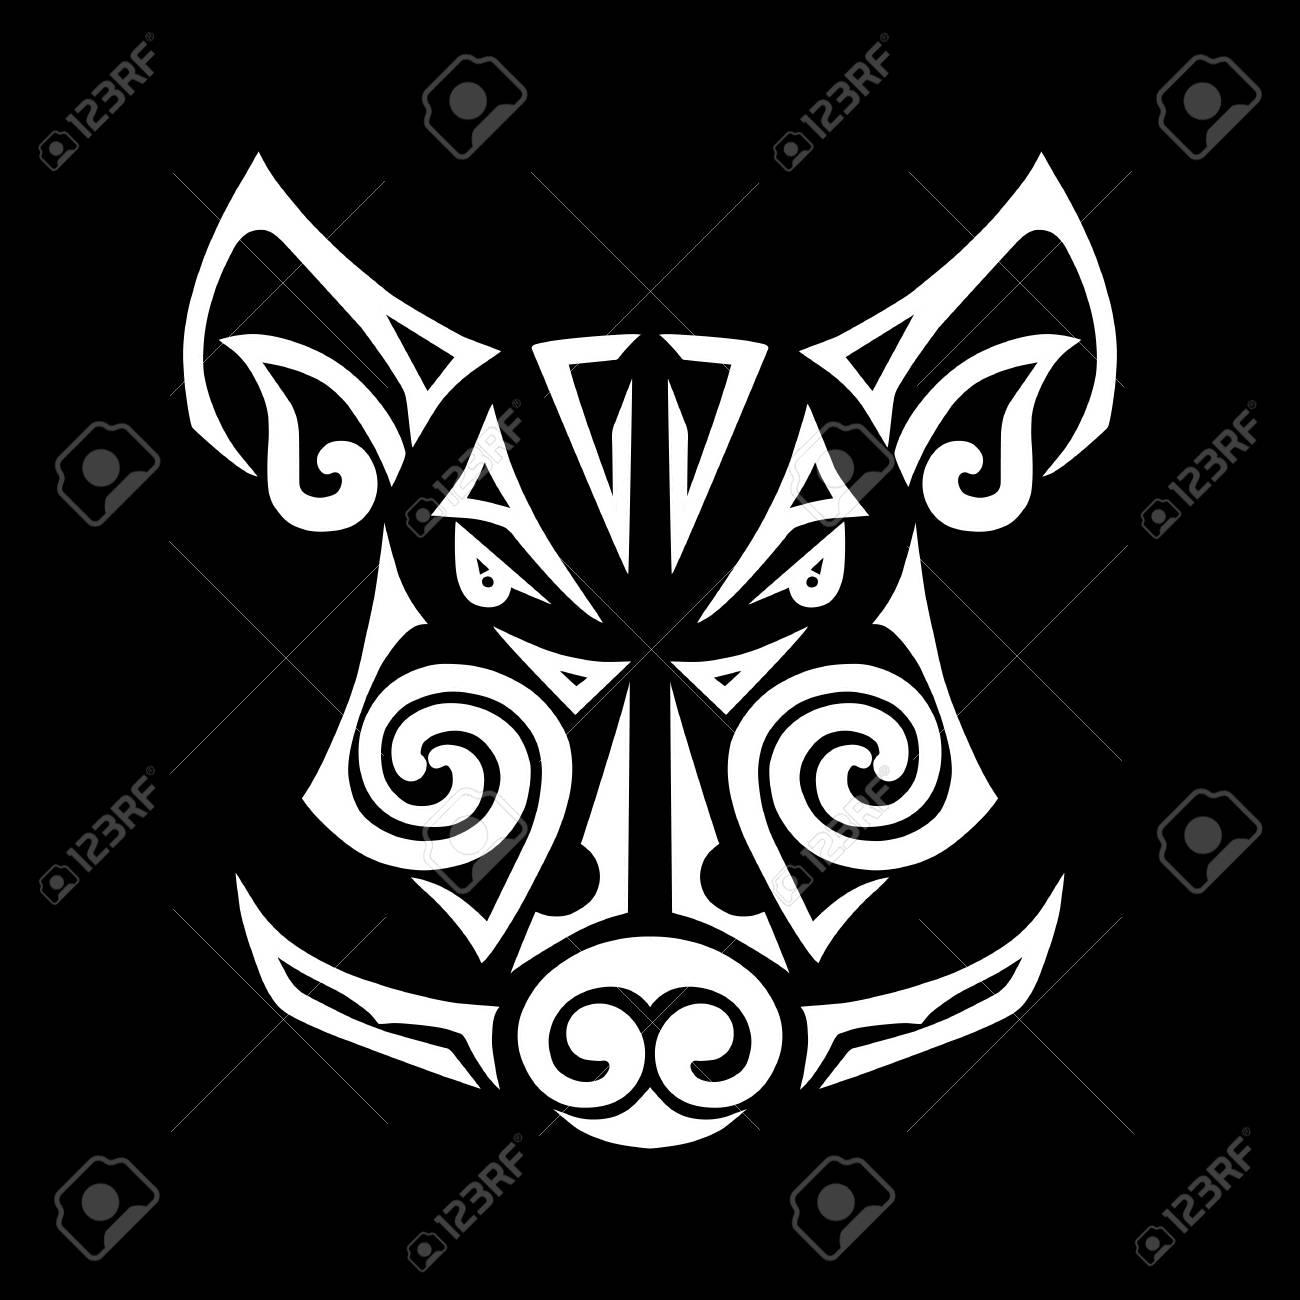 Boar Head Stylized Maori Face Tattoo Isolated On Black Background